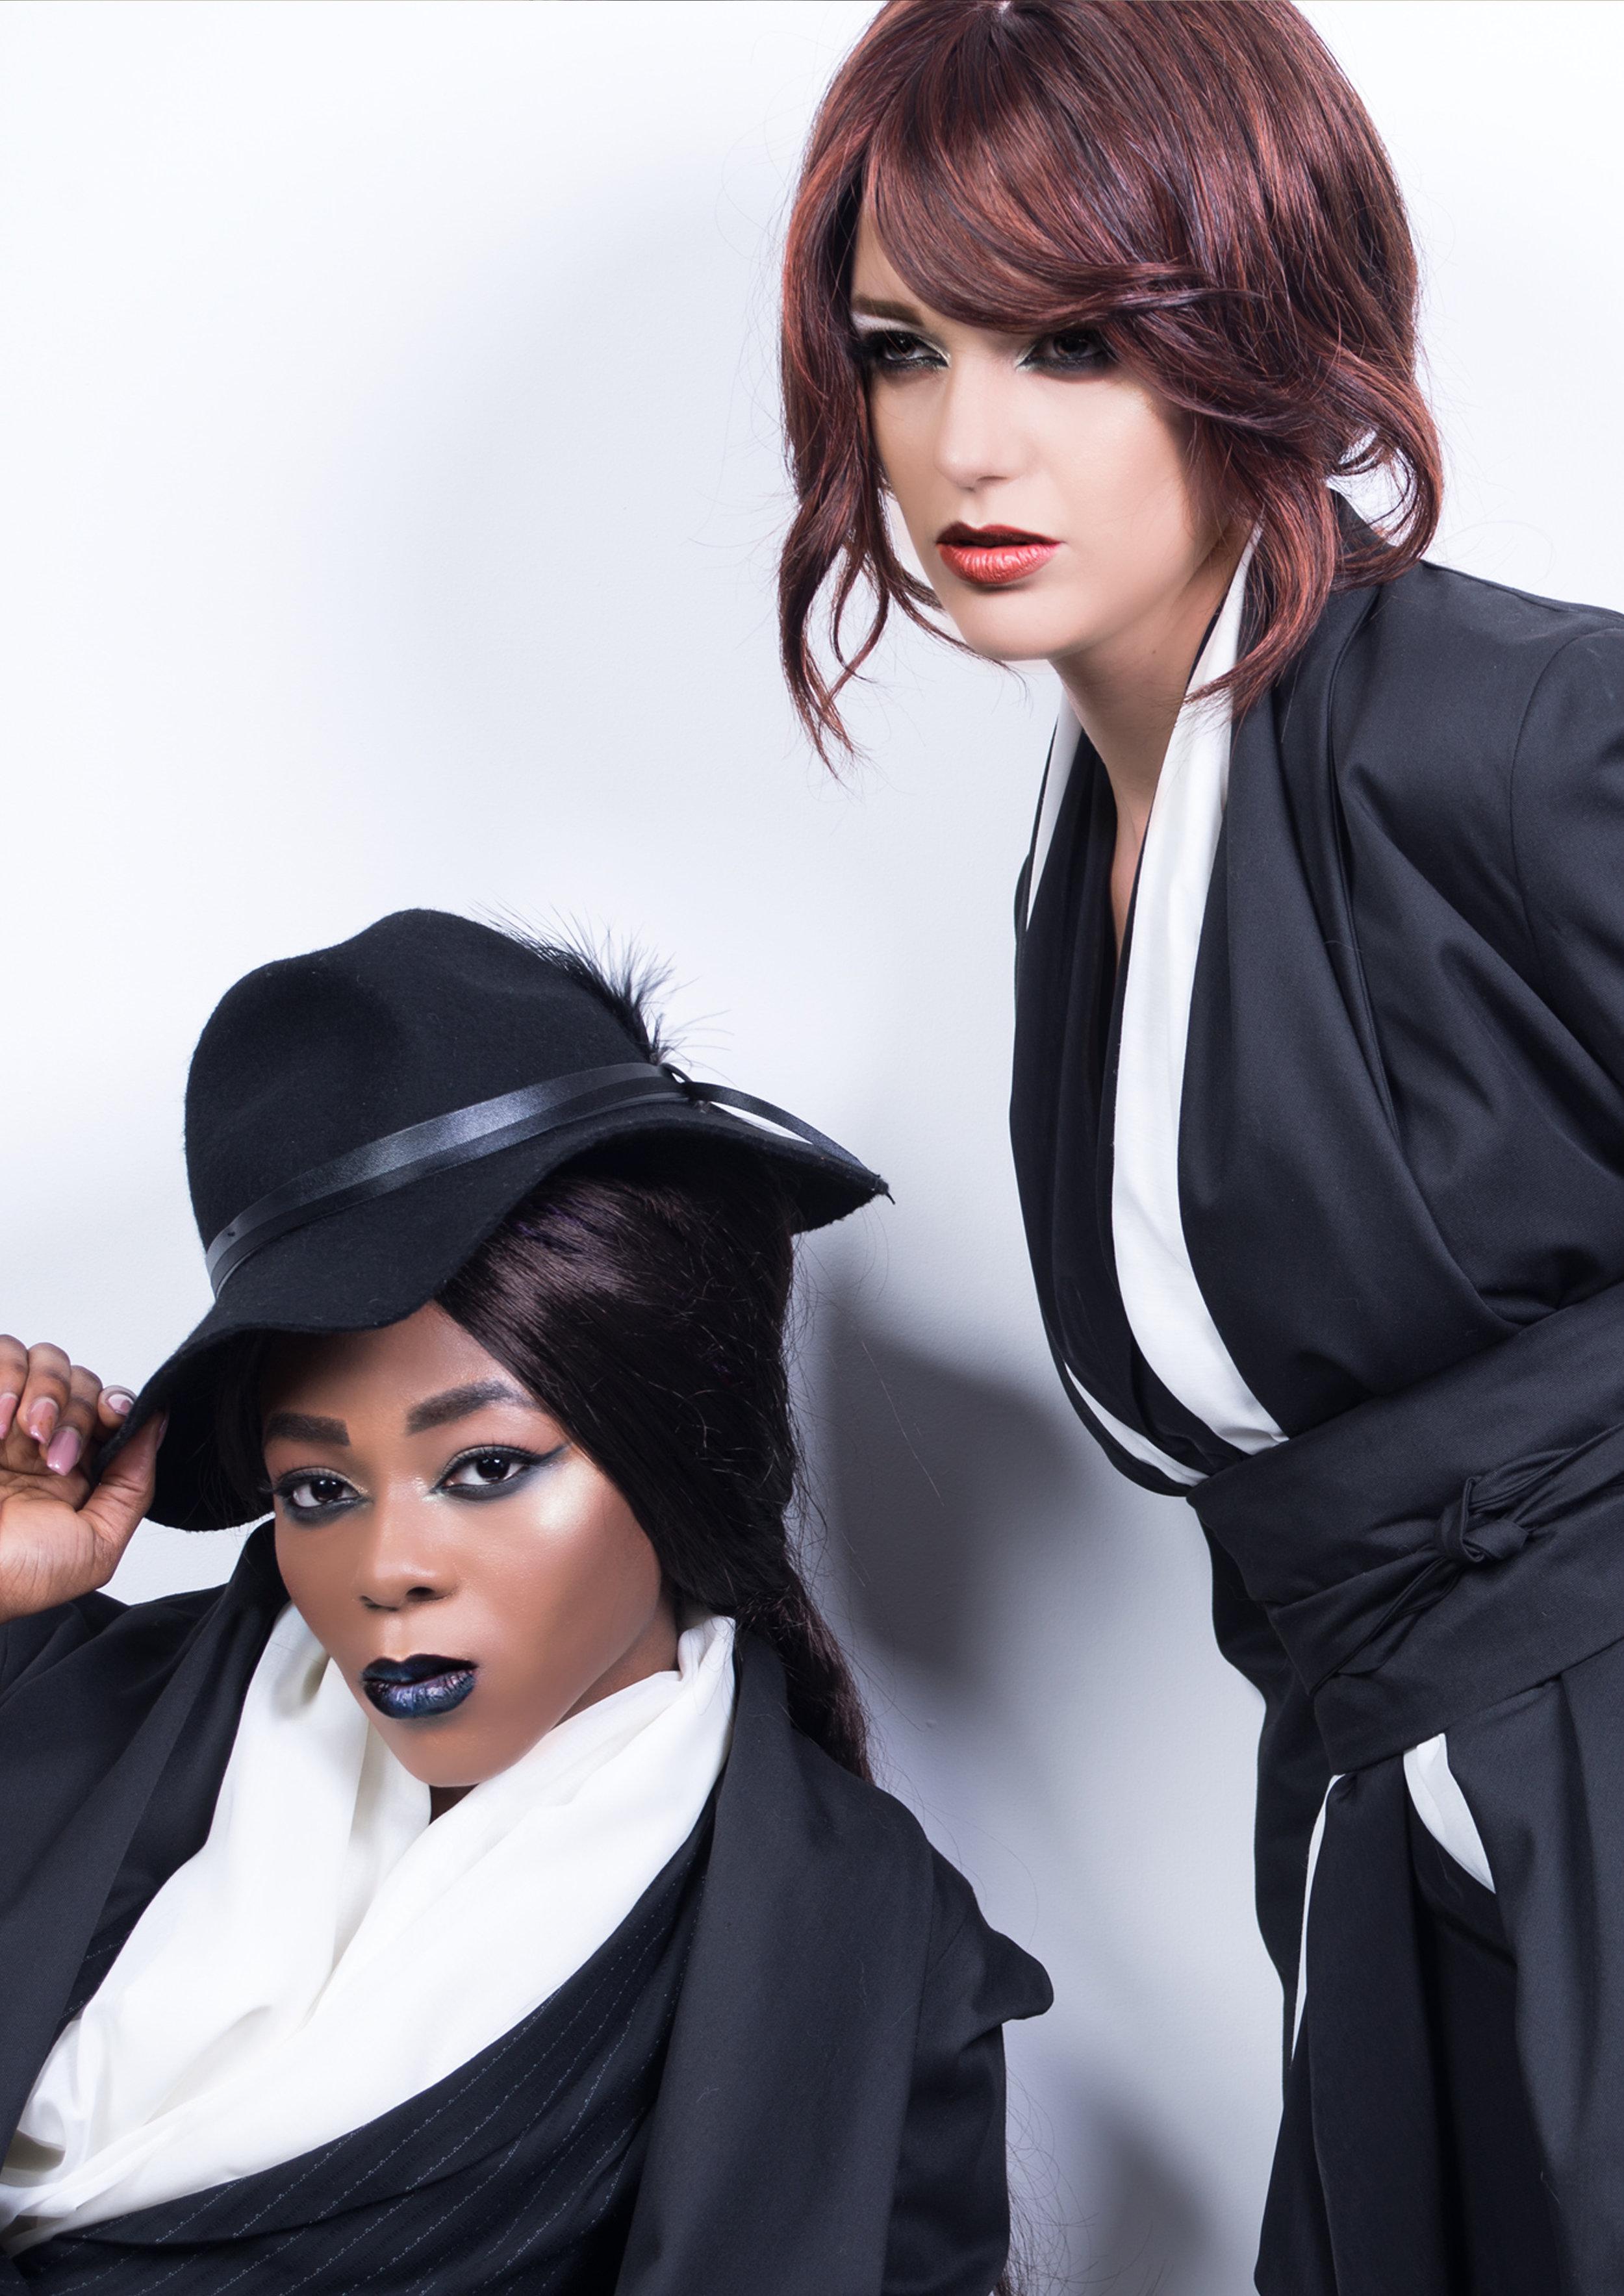 zaramia-ava-zaramiaava-leeds-fashion-designer-ethical-sustainable-tailored-minimalist-shirt-mio-rei-black-obi-belt-dress-versatile-drape-cowl-styling-studio-womenswear-models-photoshoot-black-white-7.jpg